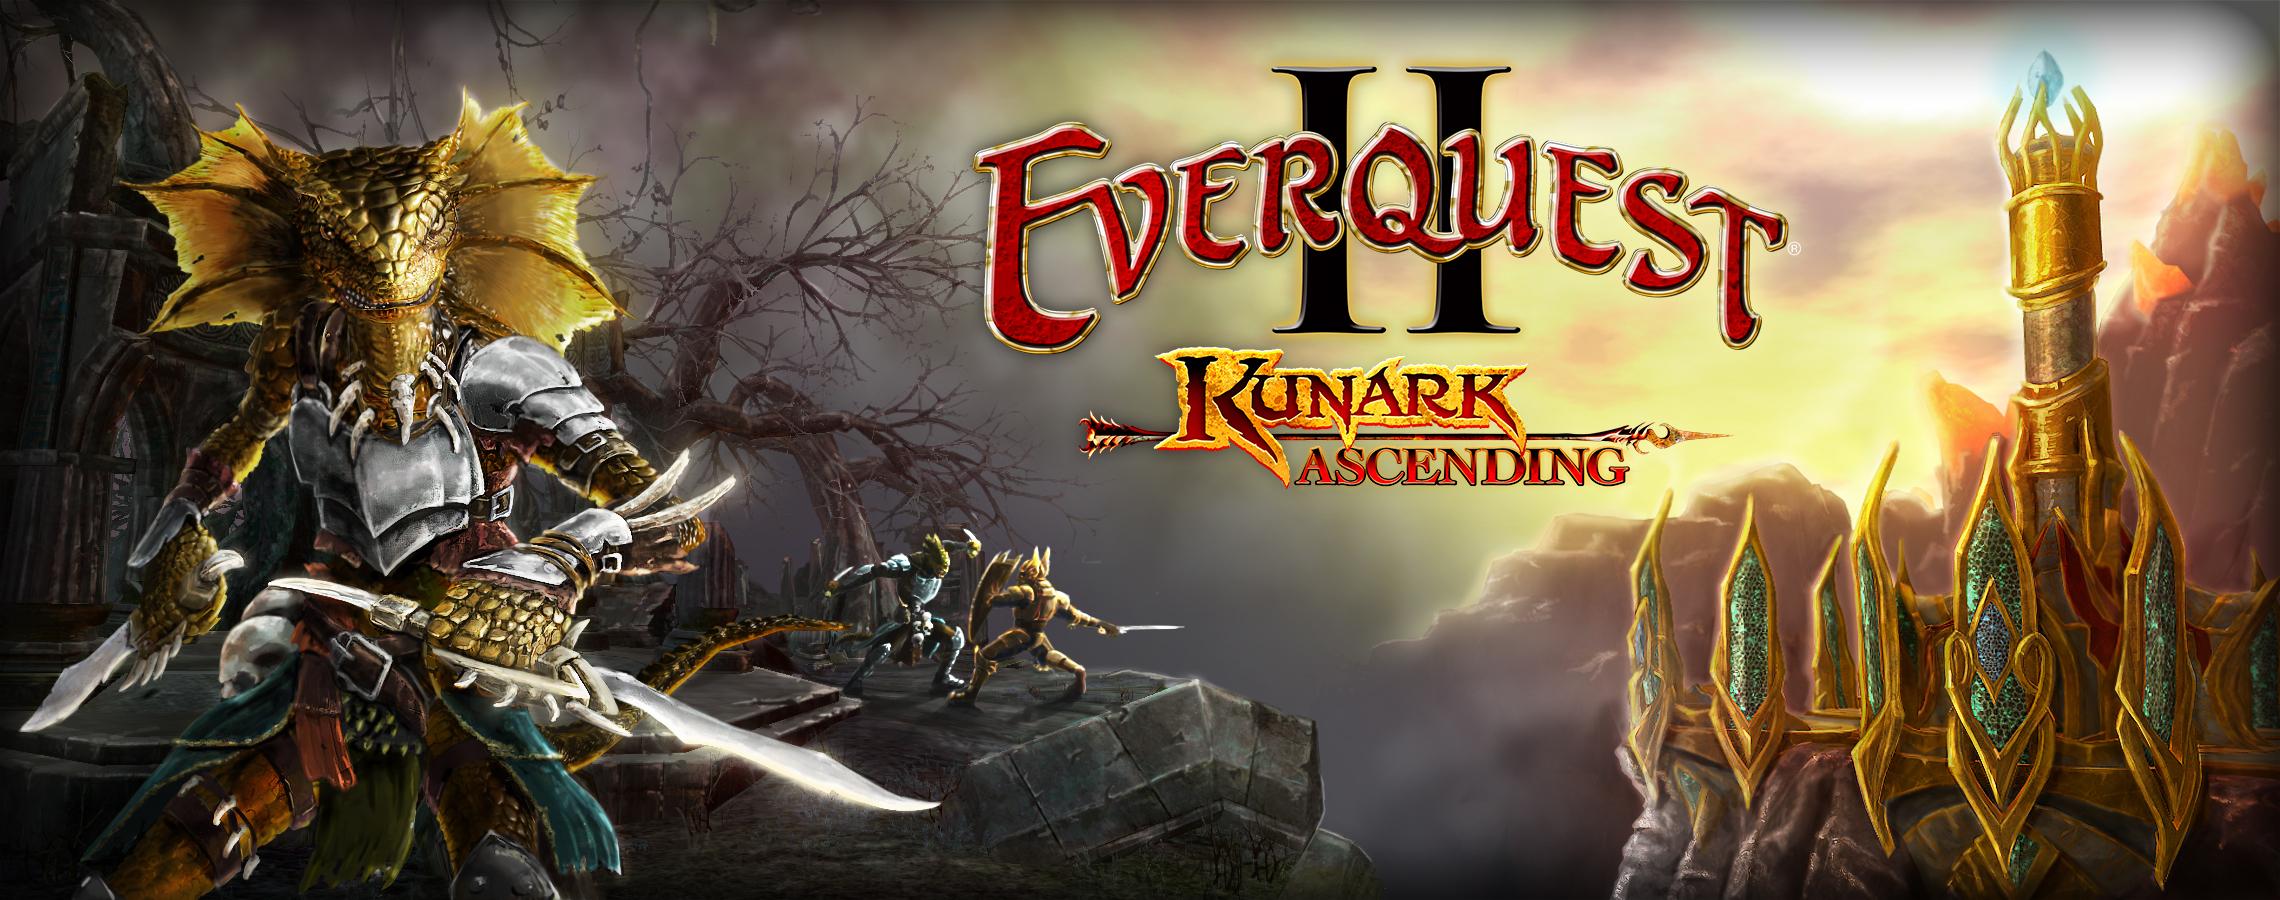 Pre Order Kunark Ascending Today EverQuest II 2280x900